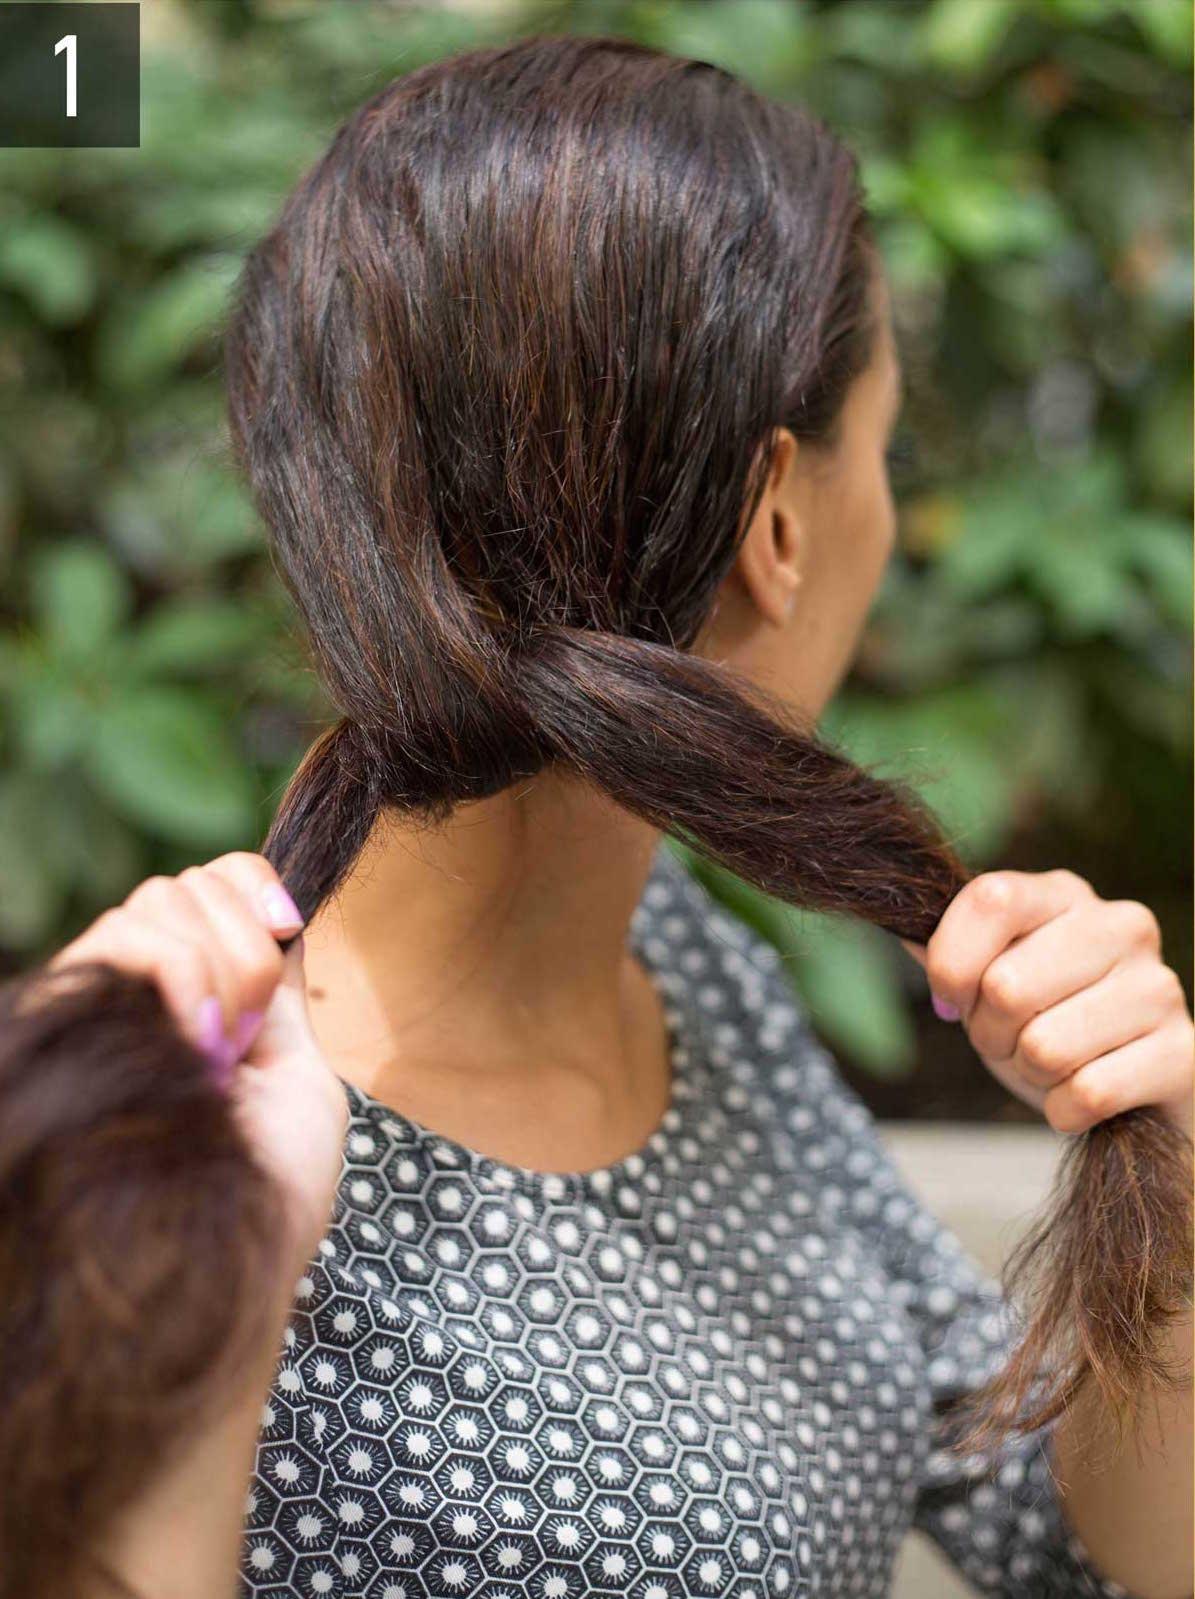 bestie-braid hair 5